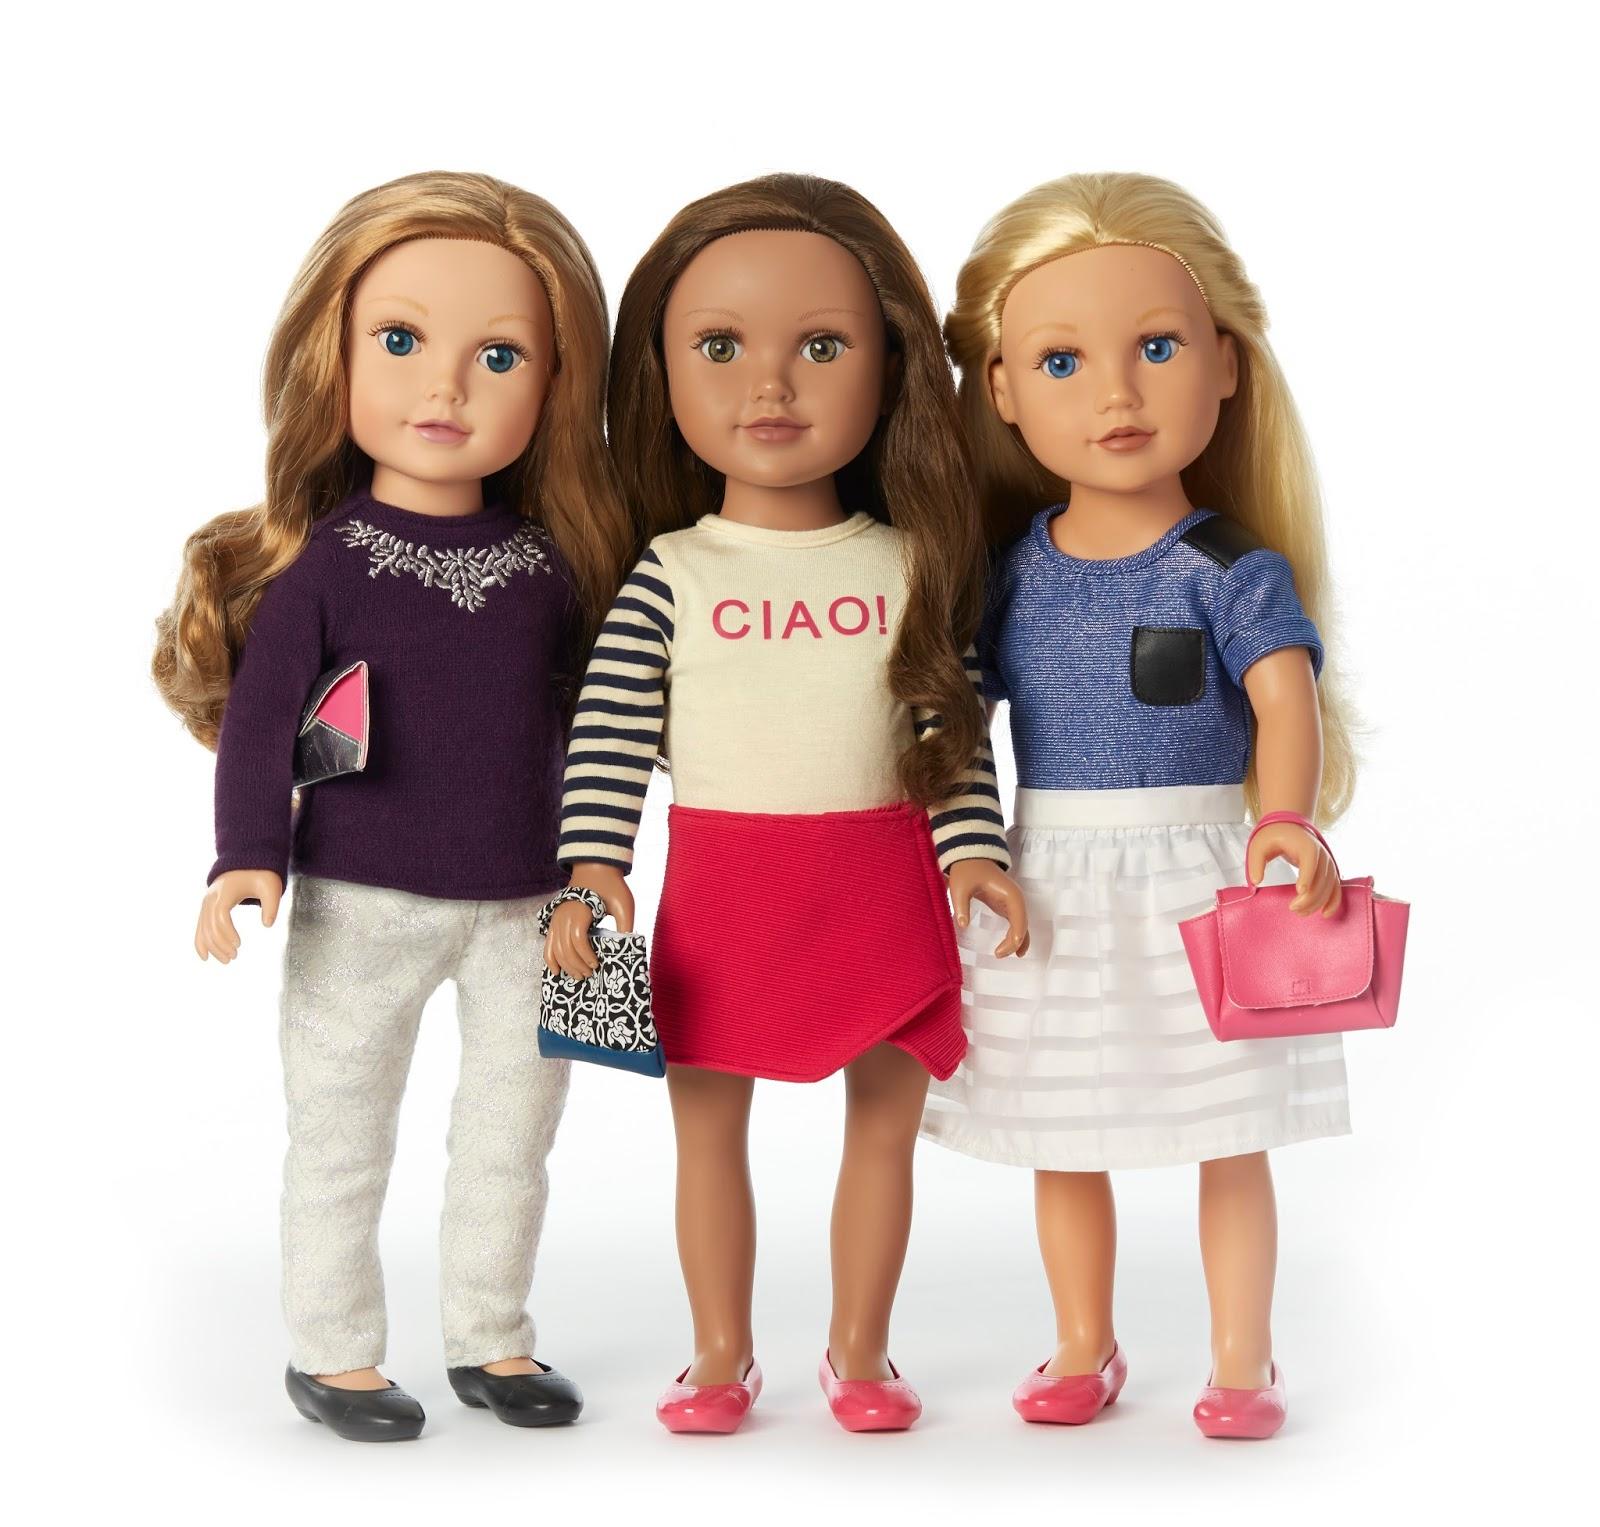 who makes journey girl dolls